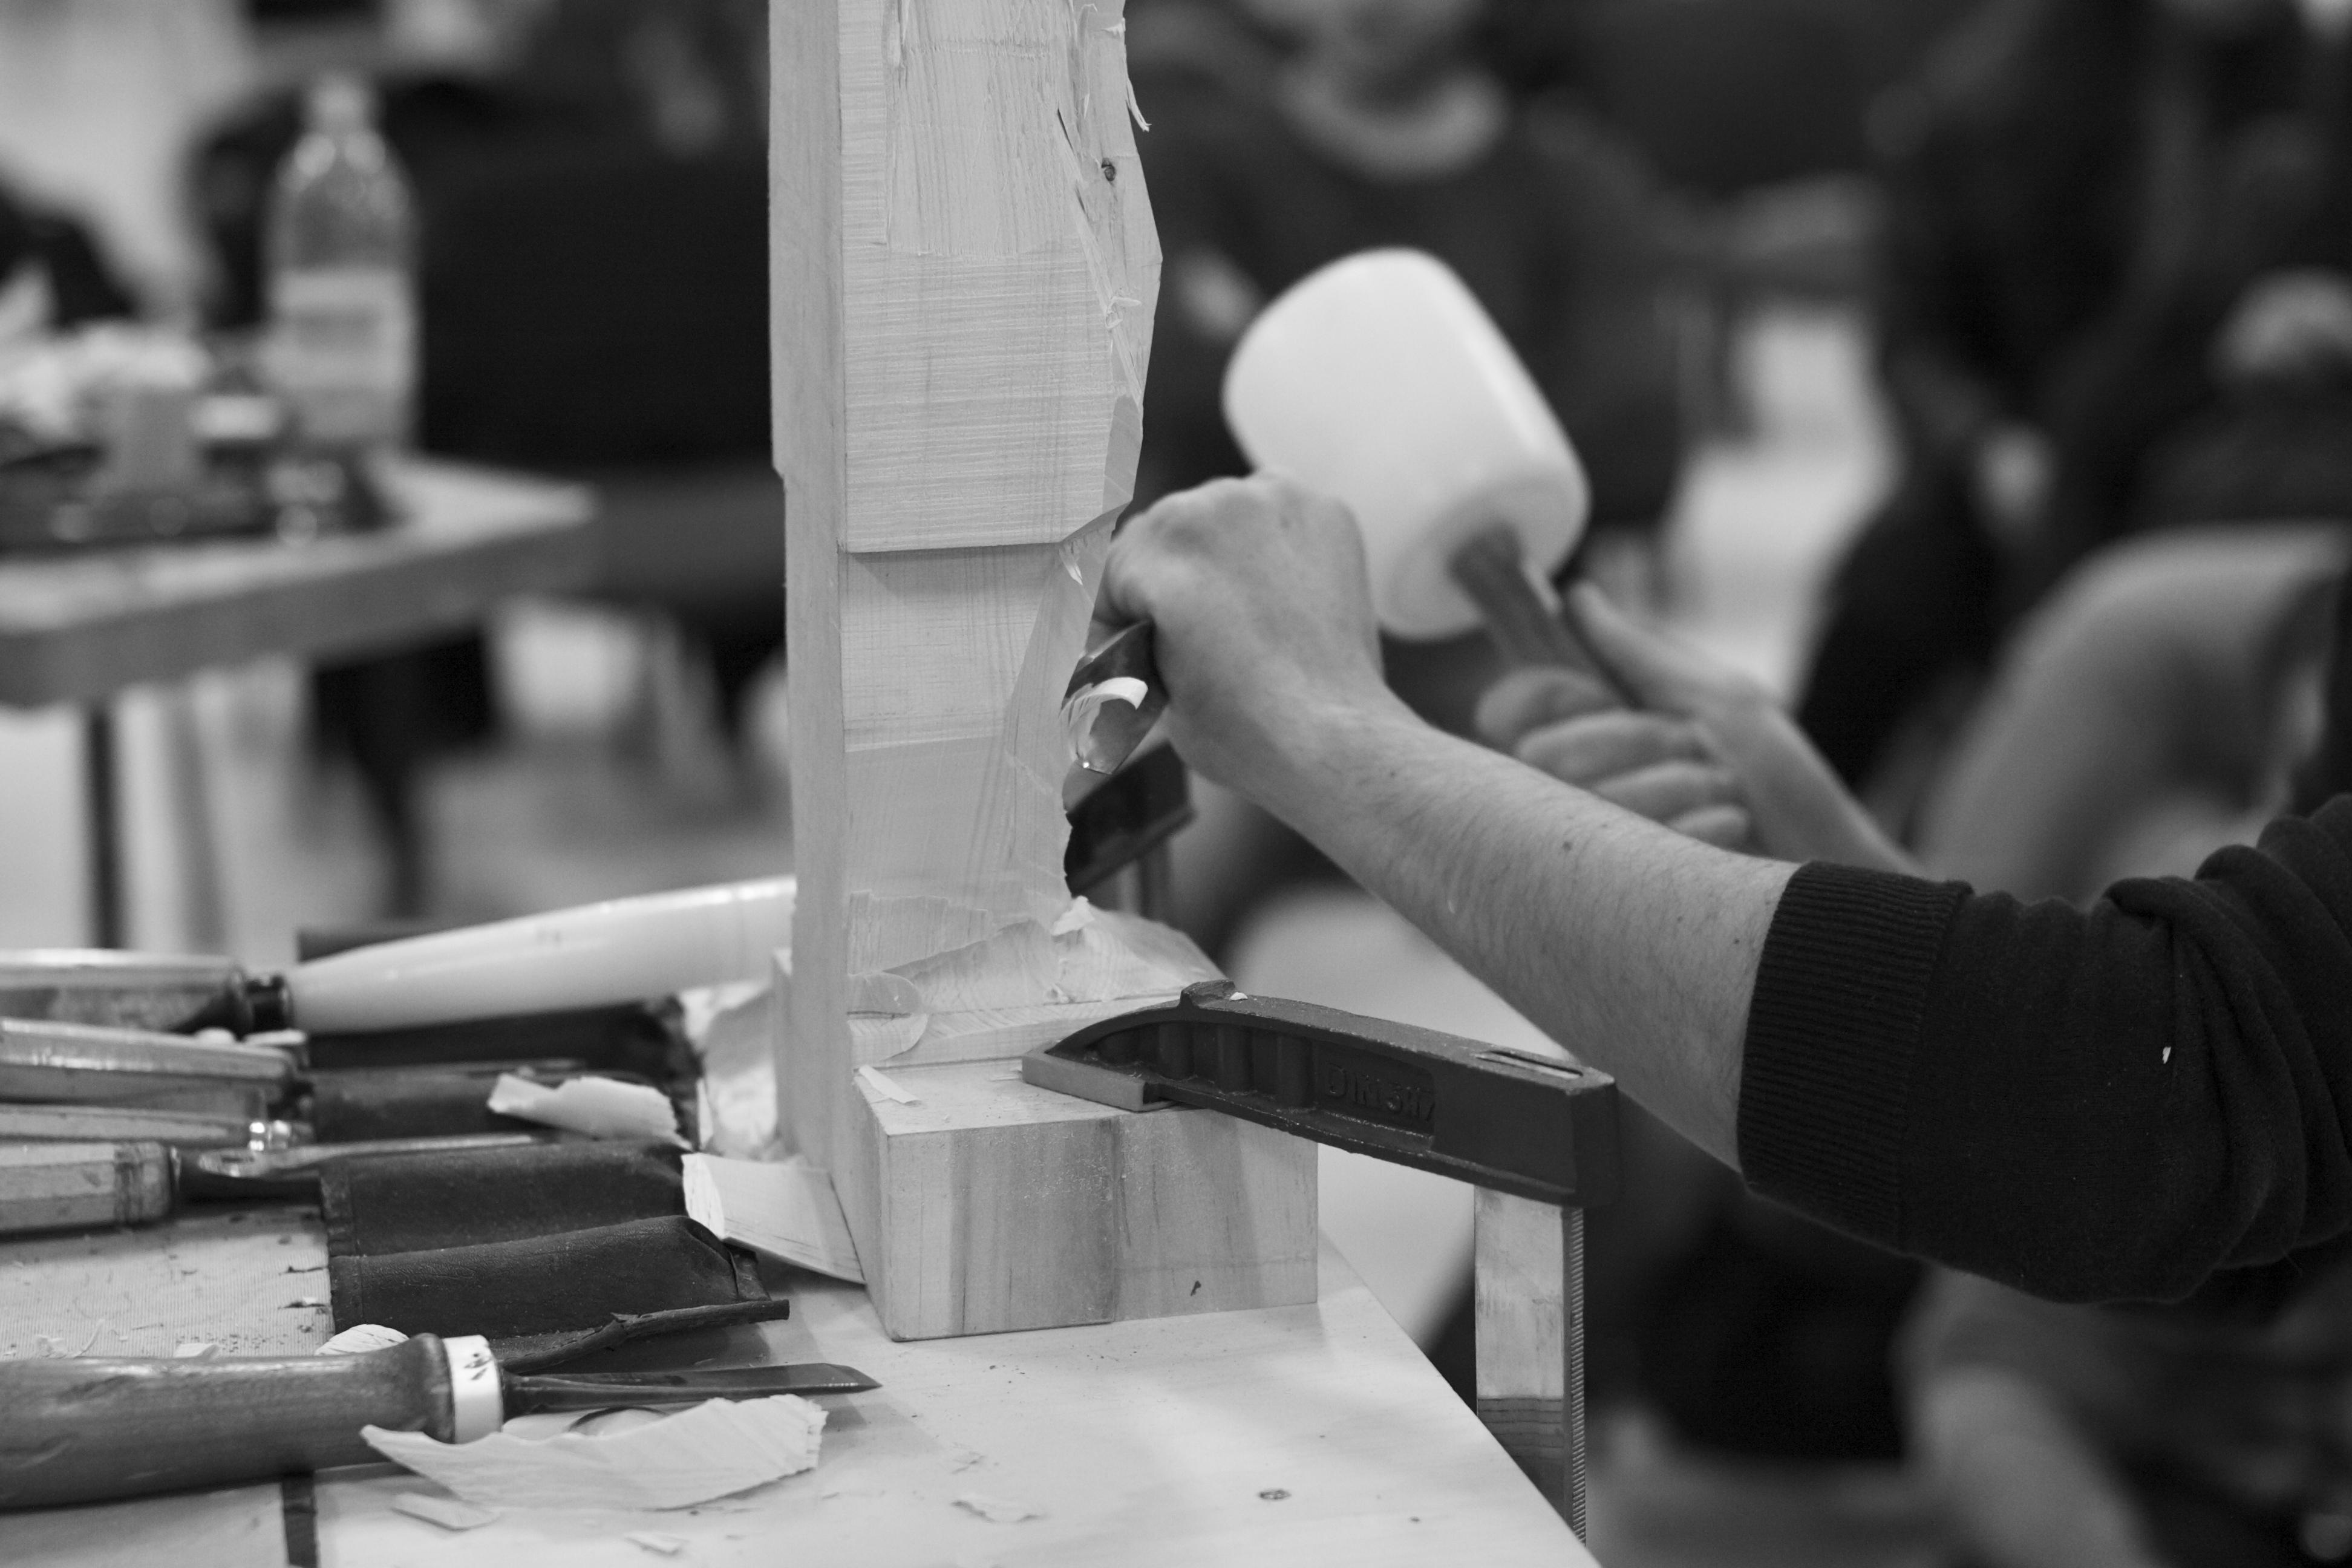 Flickr - Aron Demetz - Dialoghi e materia - Workshop a cura di Franco Reina66